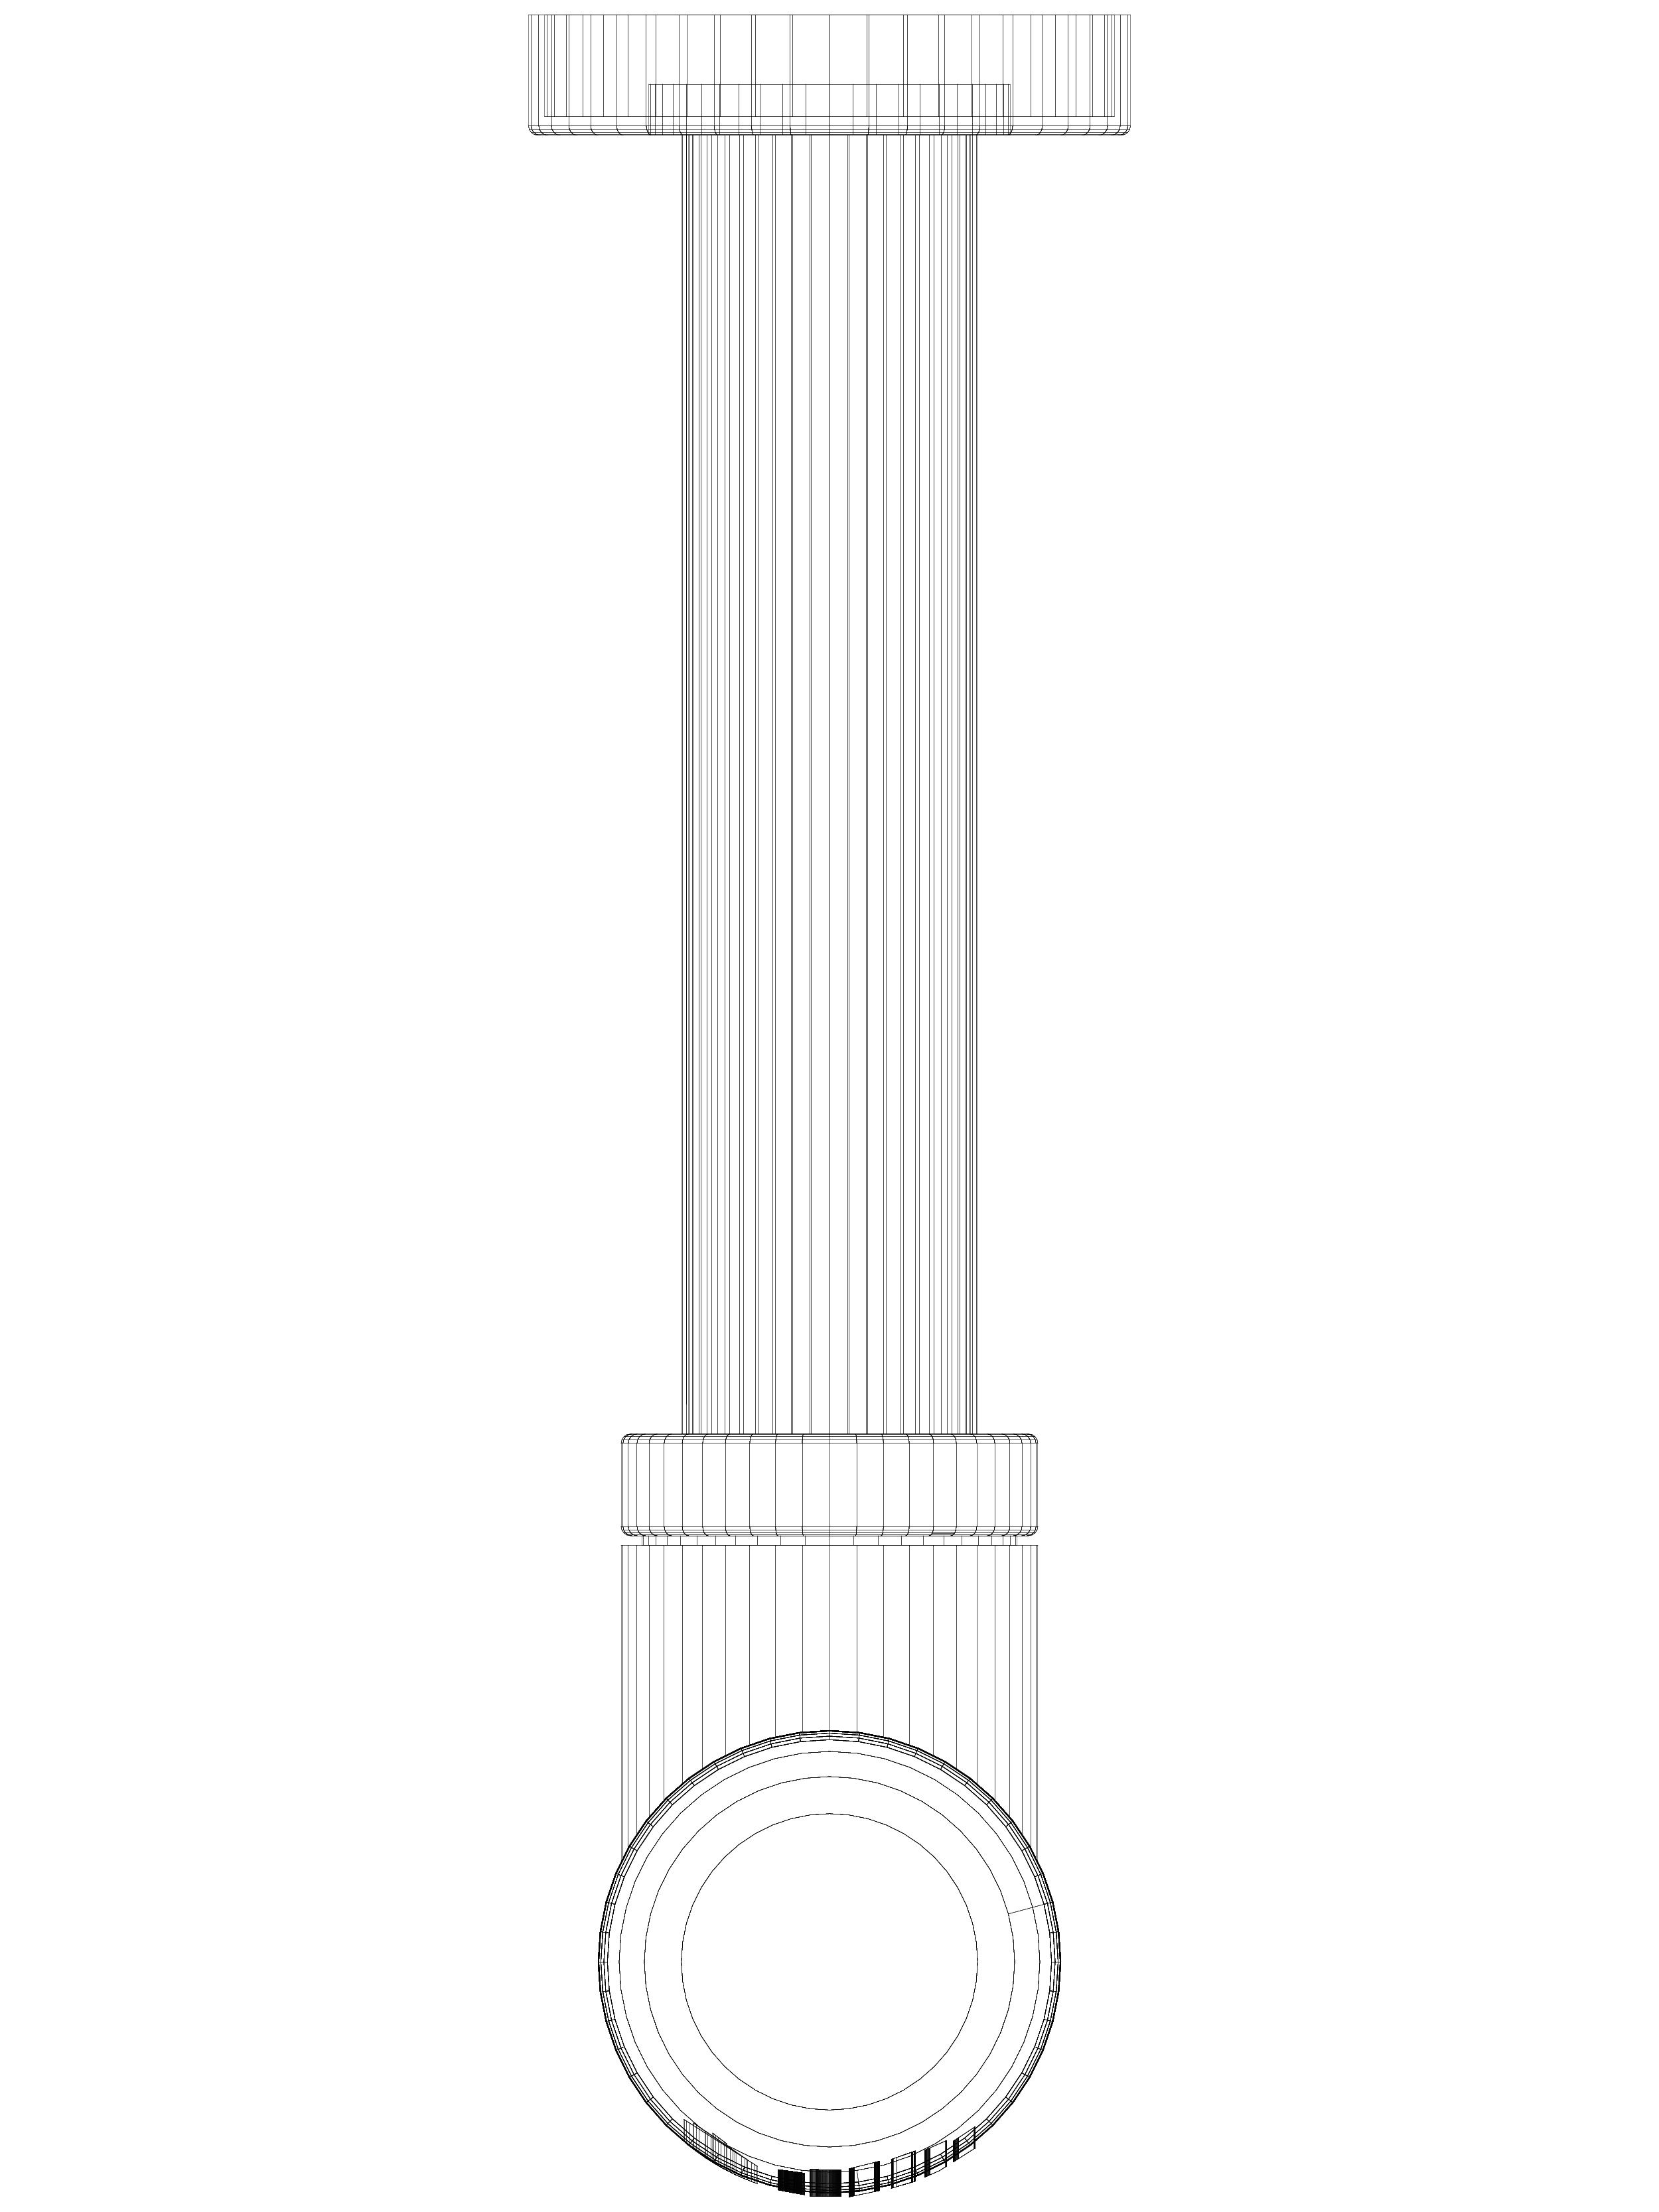 Pagina 1 - CAD-DWG Sifon design SCHELL EDITION 01 429 06 99 SCHELL Detaliu de produs Sifon Edition